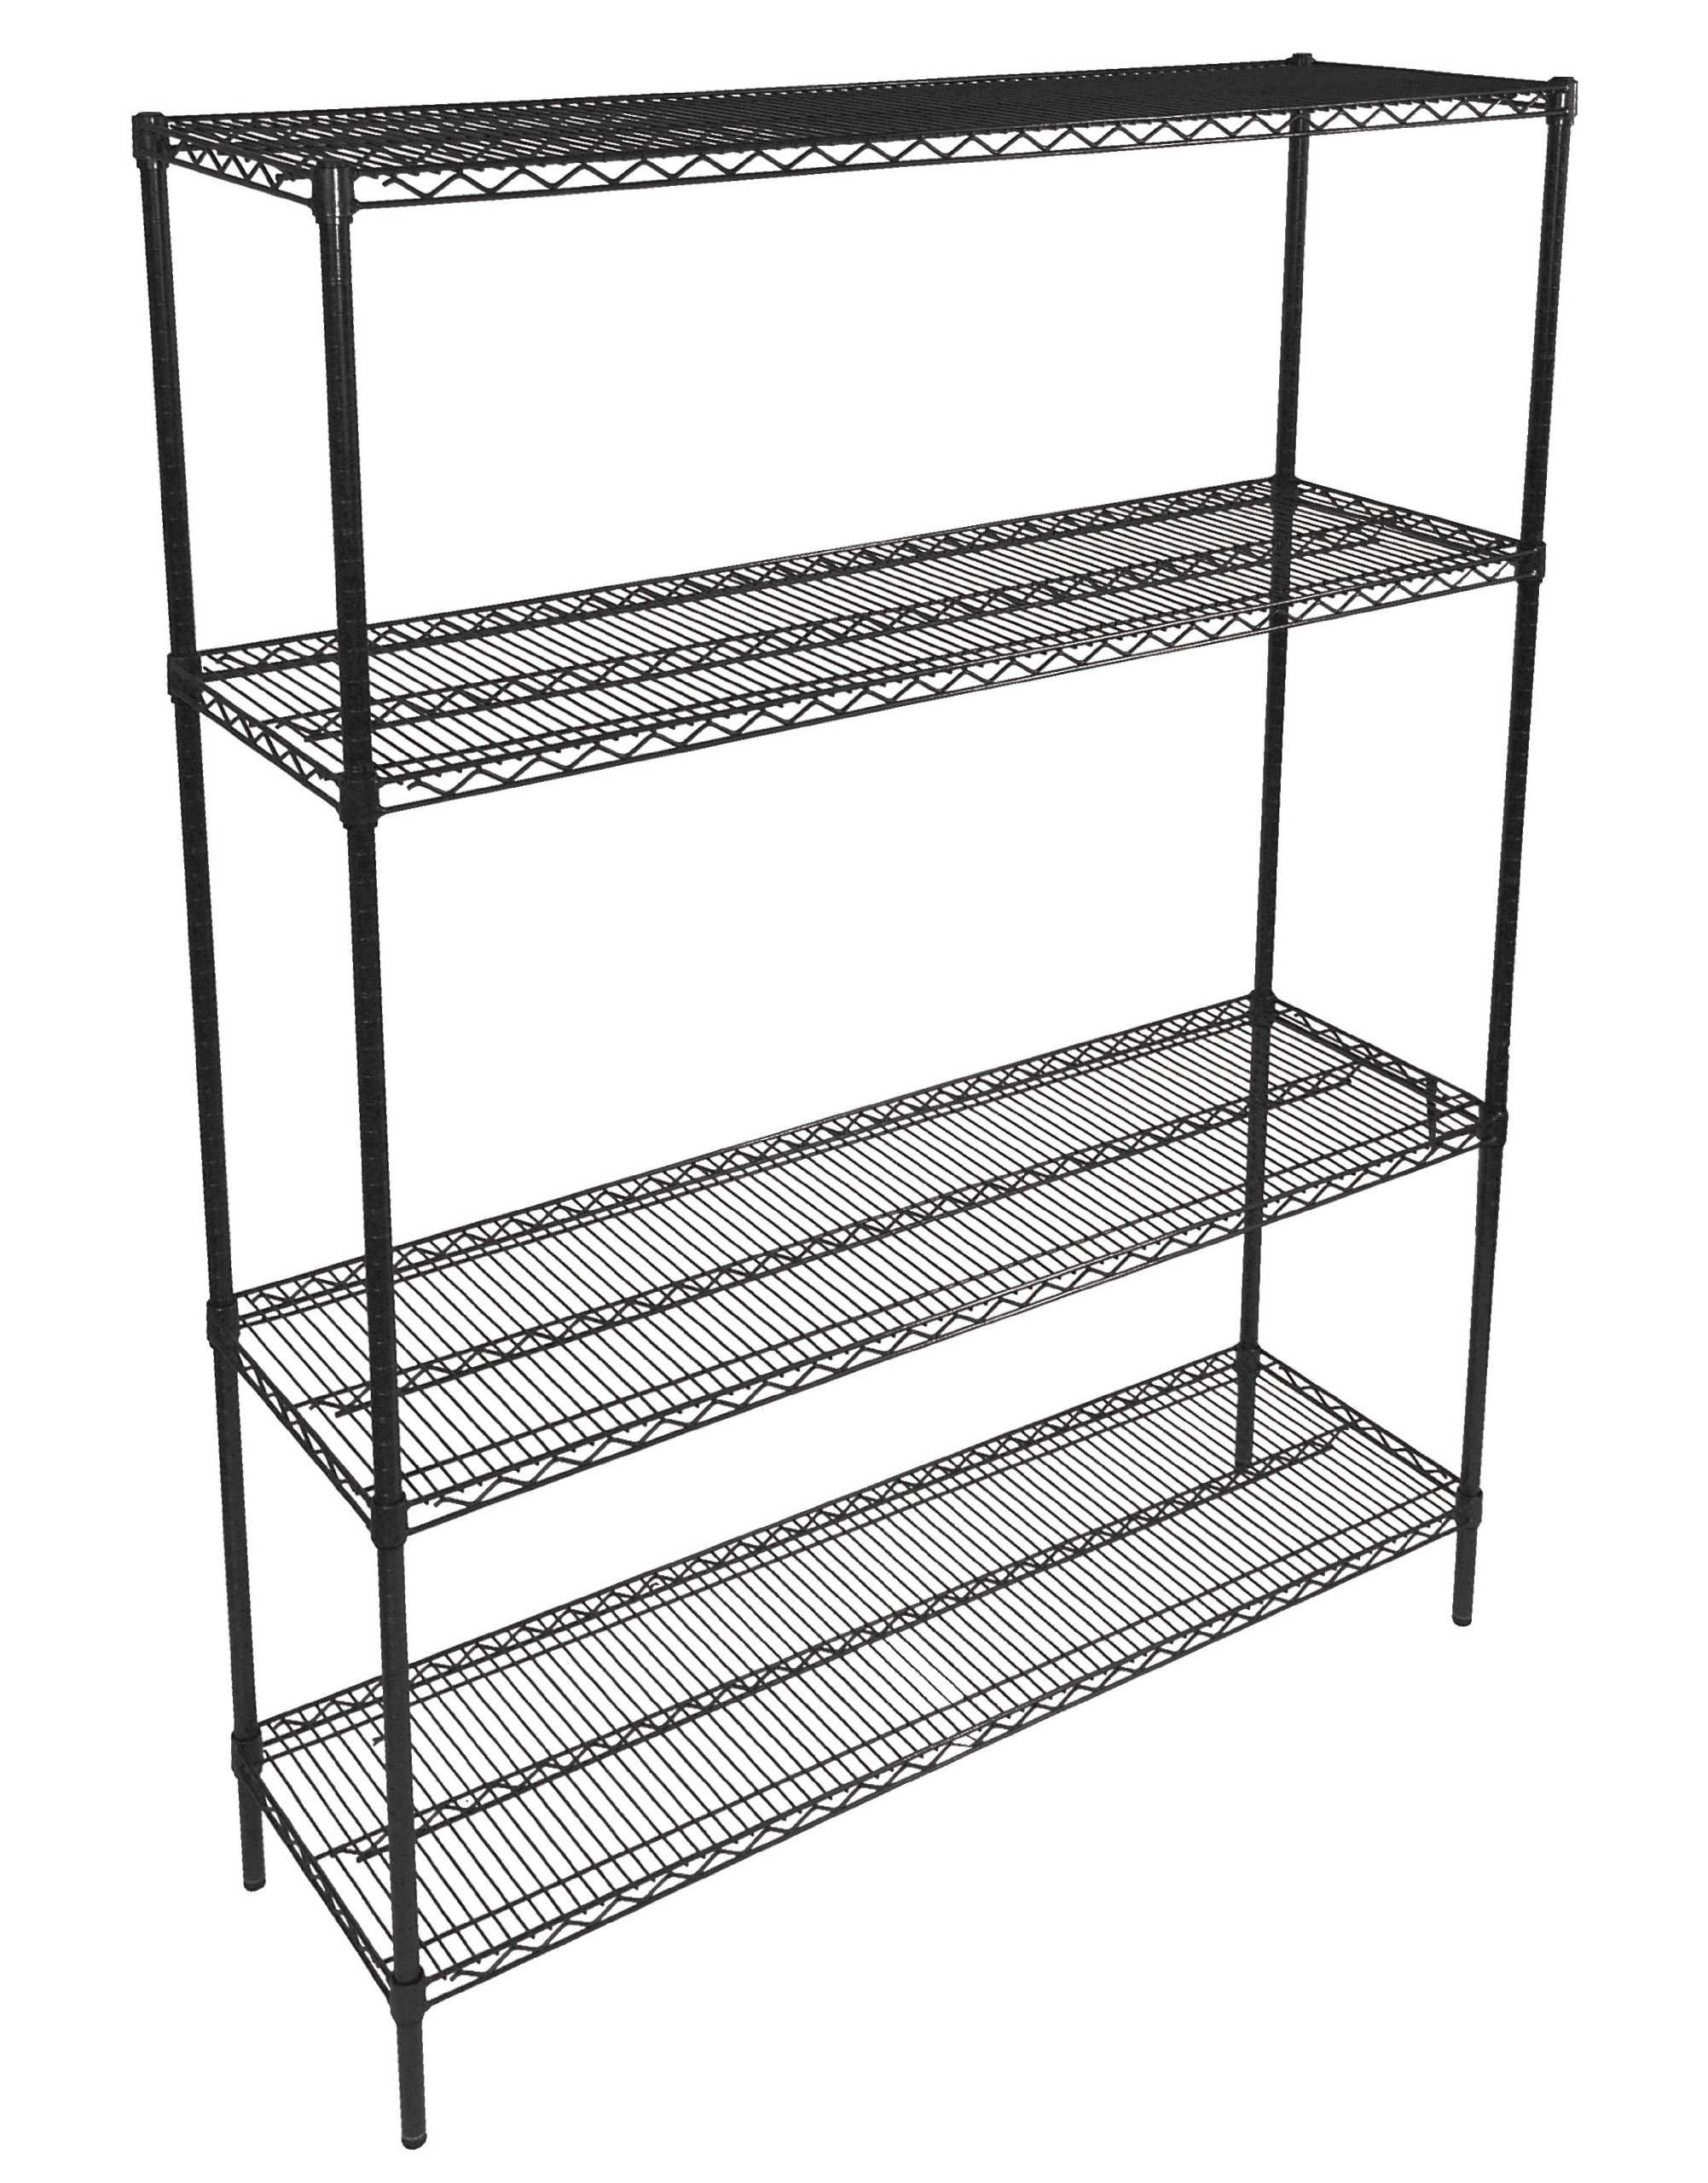 John Boos EP-183666-BK Zinc Based Epoxy Coated Wire Shelving Kit, 66'' Tall Posts, 36'' Length x 18'' Width Shelves, Black